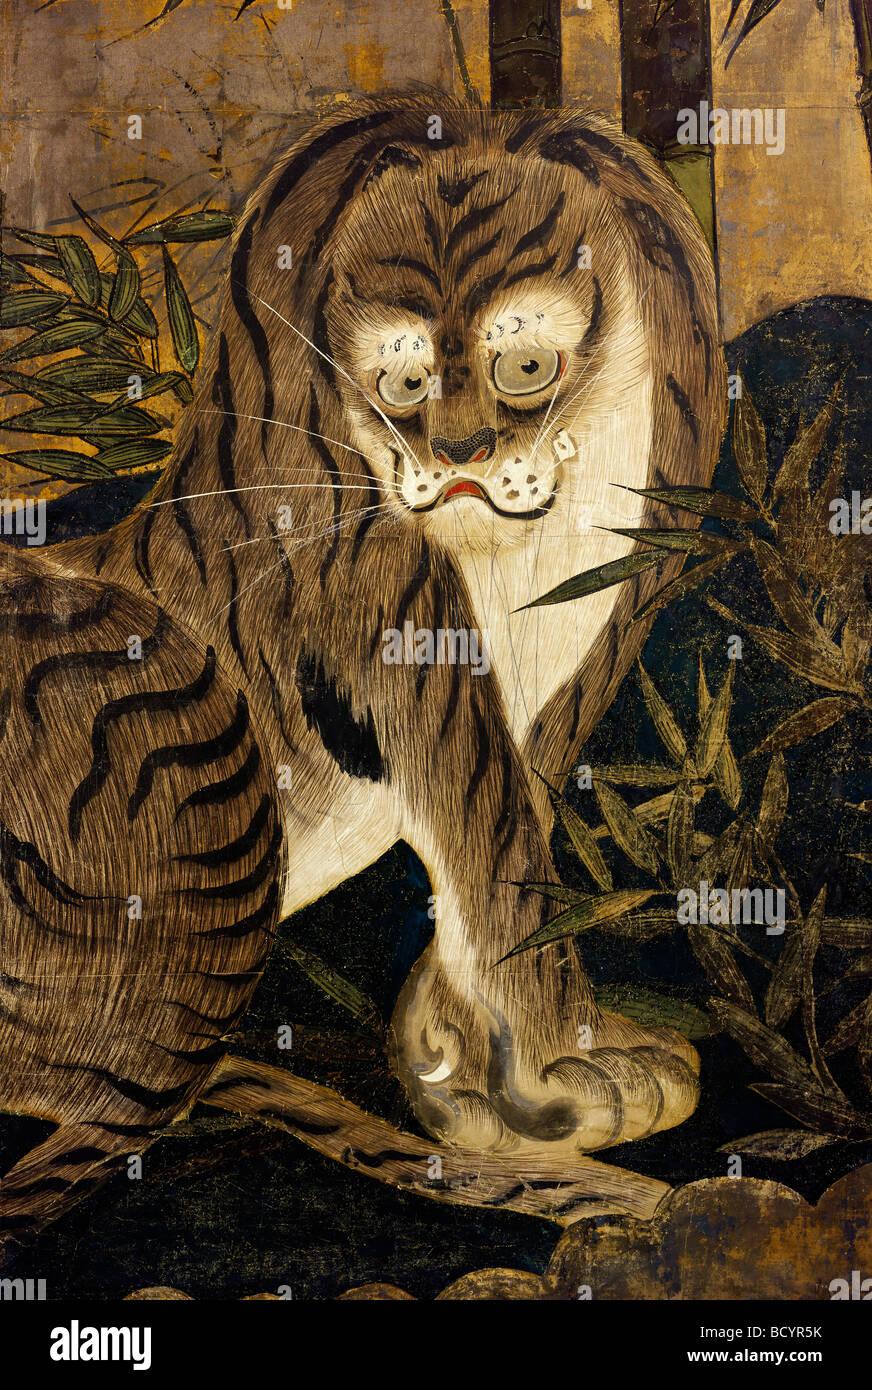 Japanese tiger stockfotos japanese tiger bilder alamy - Bemalte leinwande ...